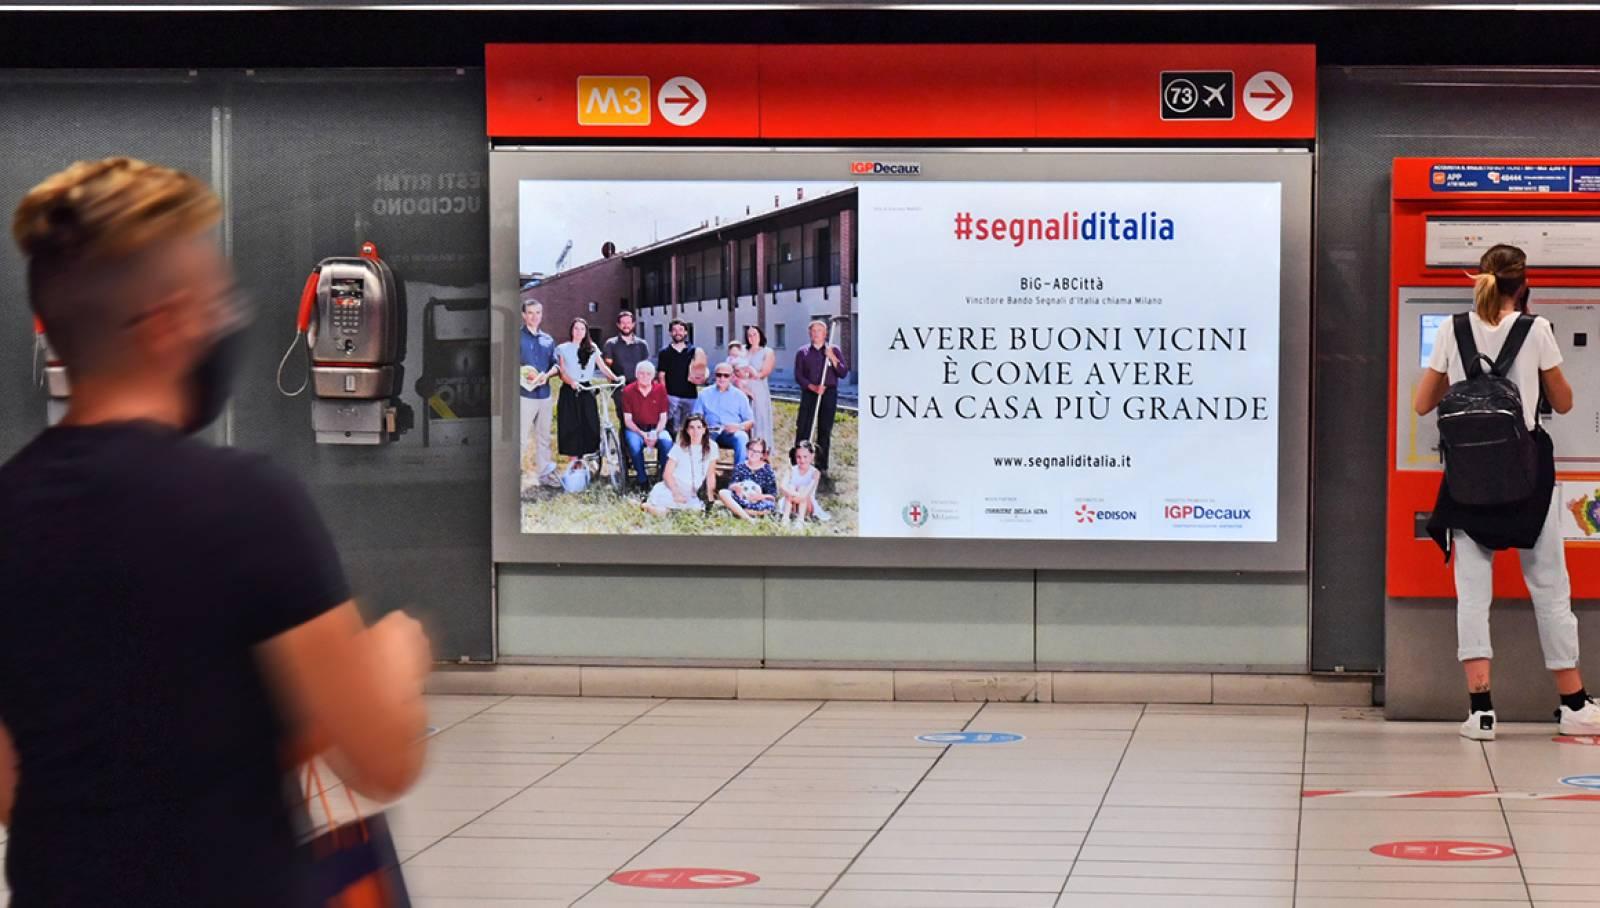 IGPDecaux campagna OOH vincitori bando Segnali d'Italia circuito Maxi per big AbCittà in metropolitana a Milano